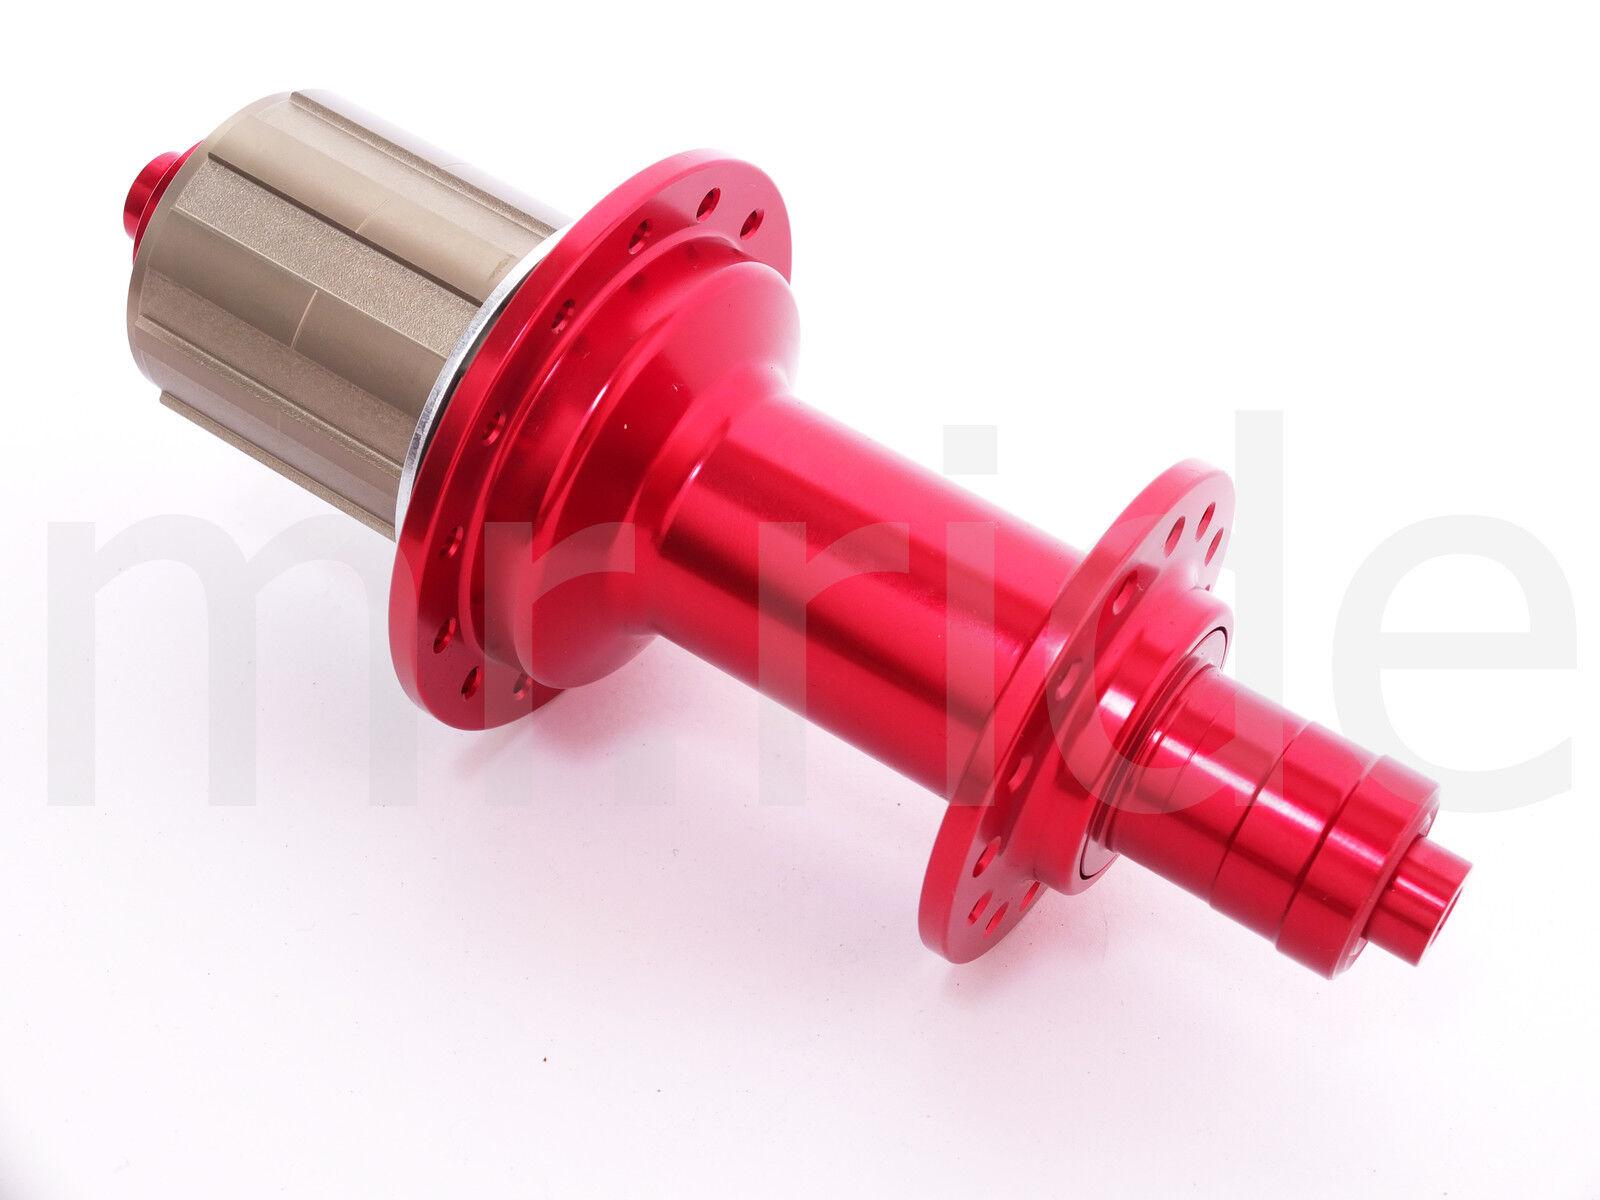 UniQ  Rear Hub R013 48T 28H Sram 10,11 Speed Red for Road bike wheel